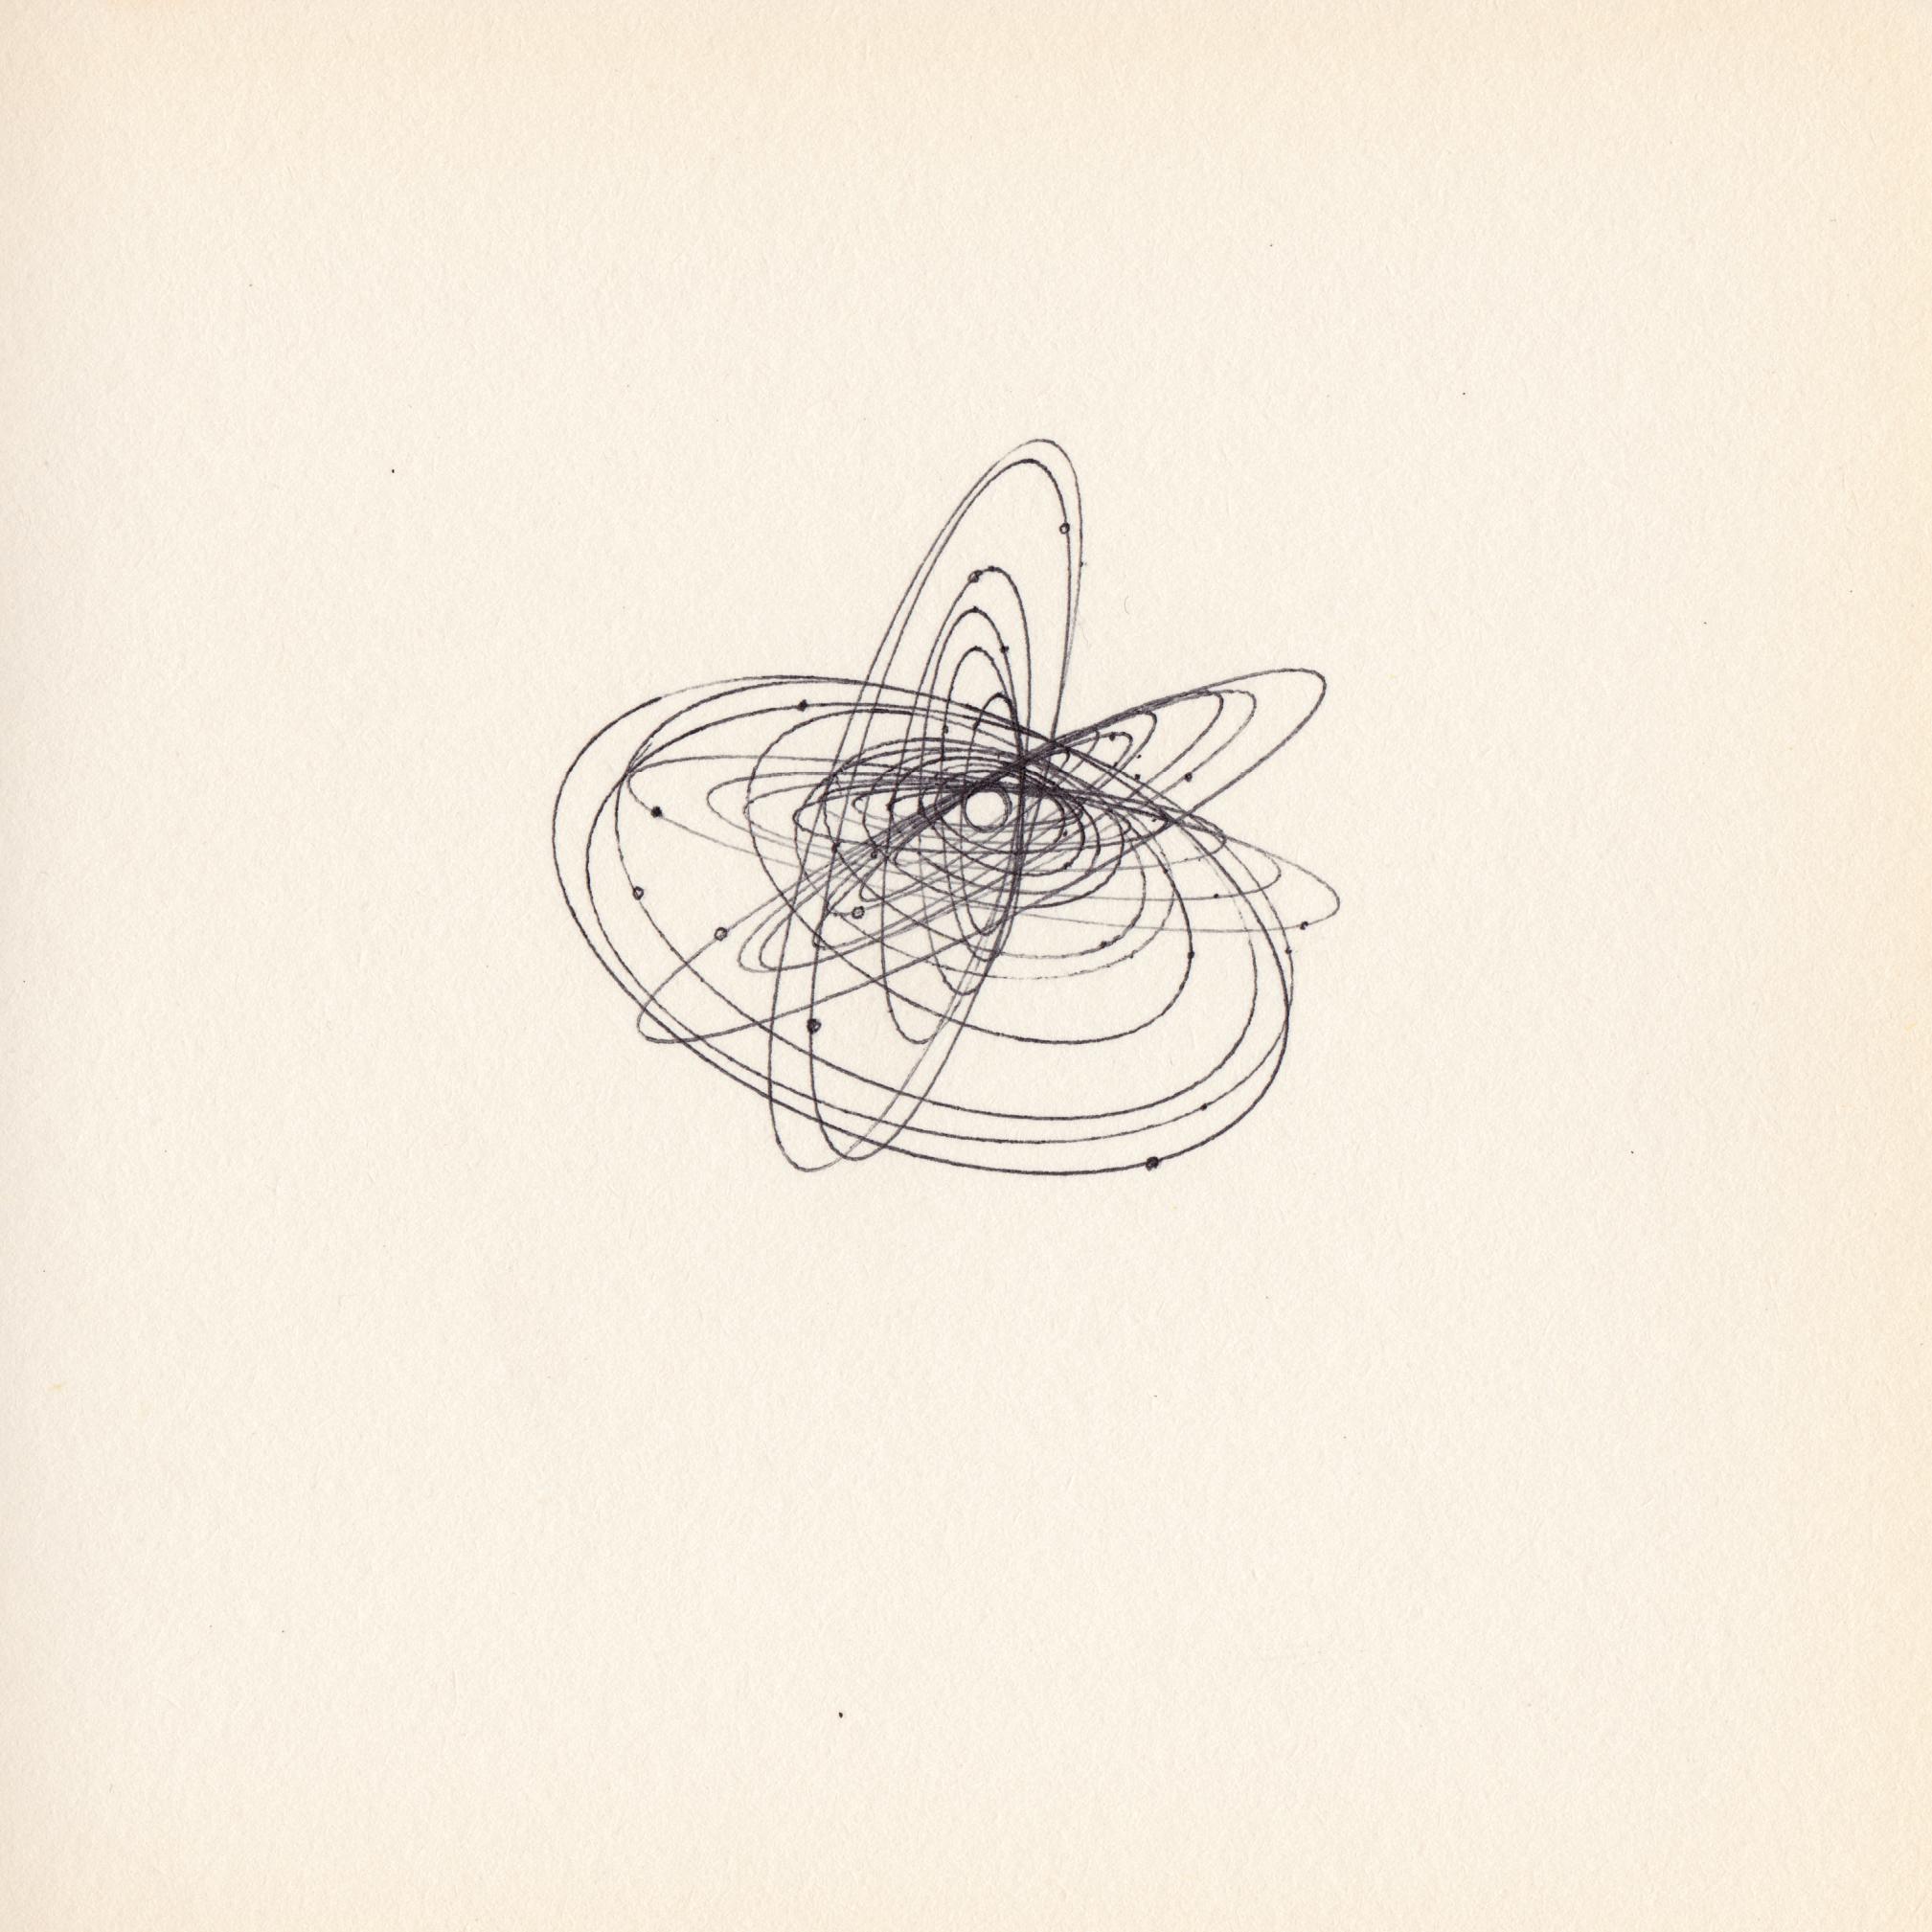 JEREMY RUMAS ART + PEN and MARKER SKETCHES _ ORBIT 01 + space + solar system + futurism + modern art +www.jeremyrumas.com.jpeg